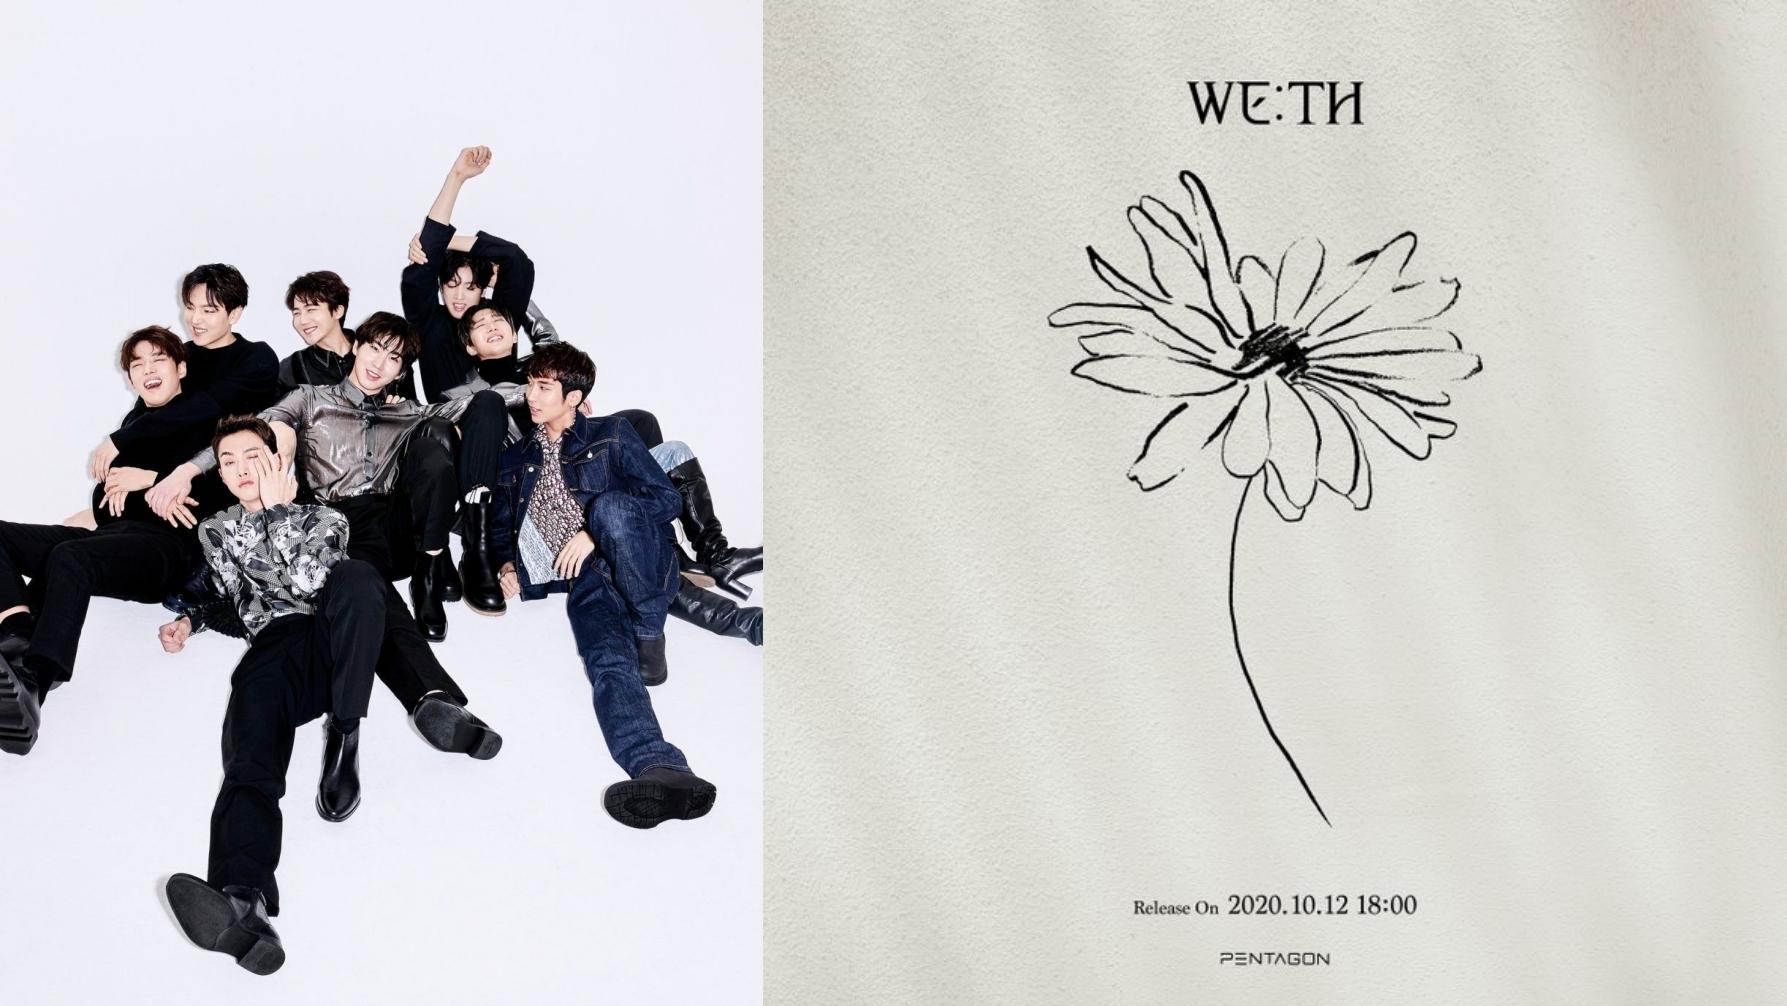 PENTAGON Leaks Comeback Date With Mini Album 'WE:TH'